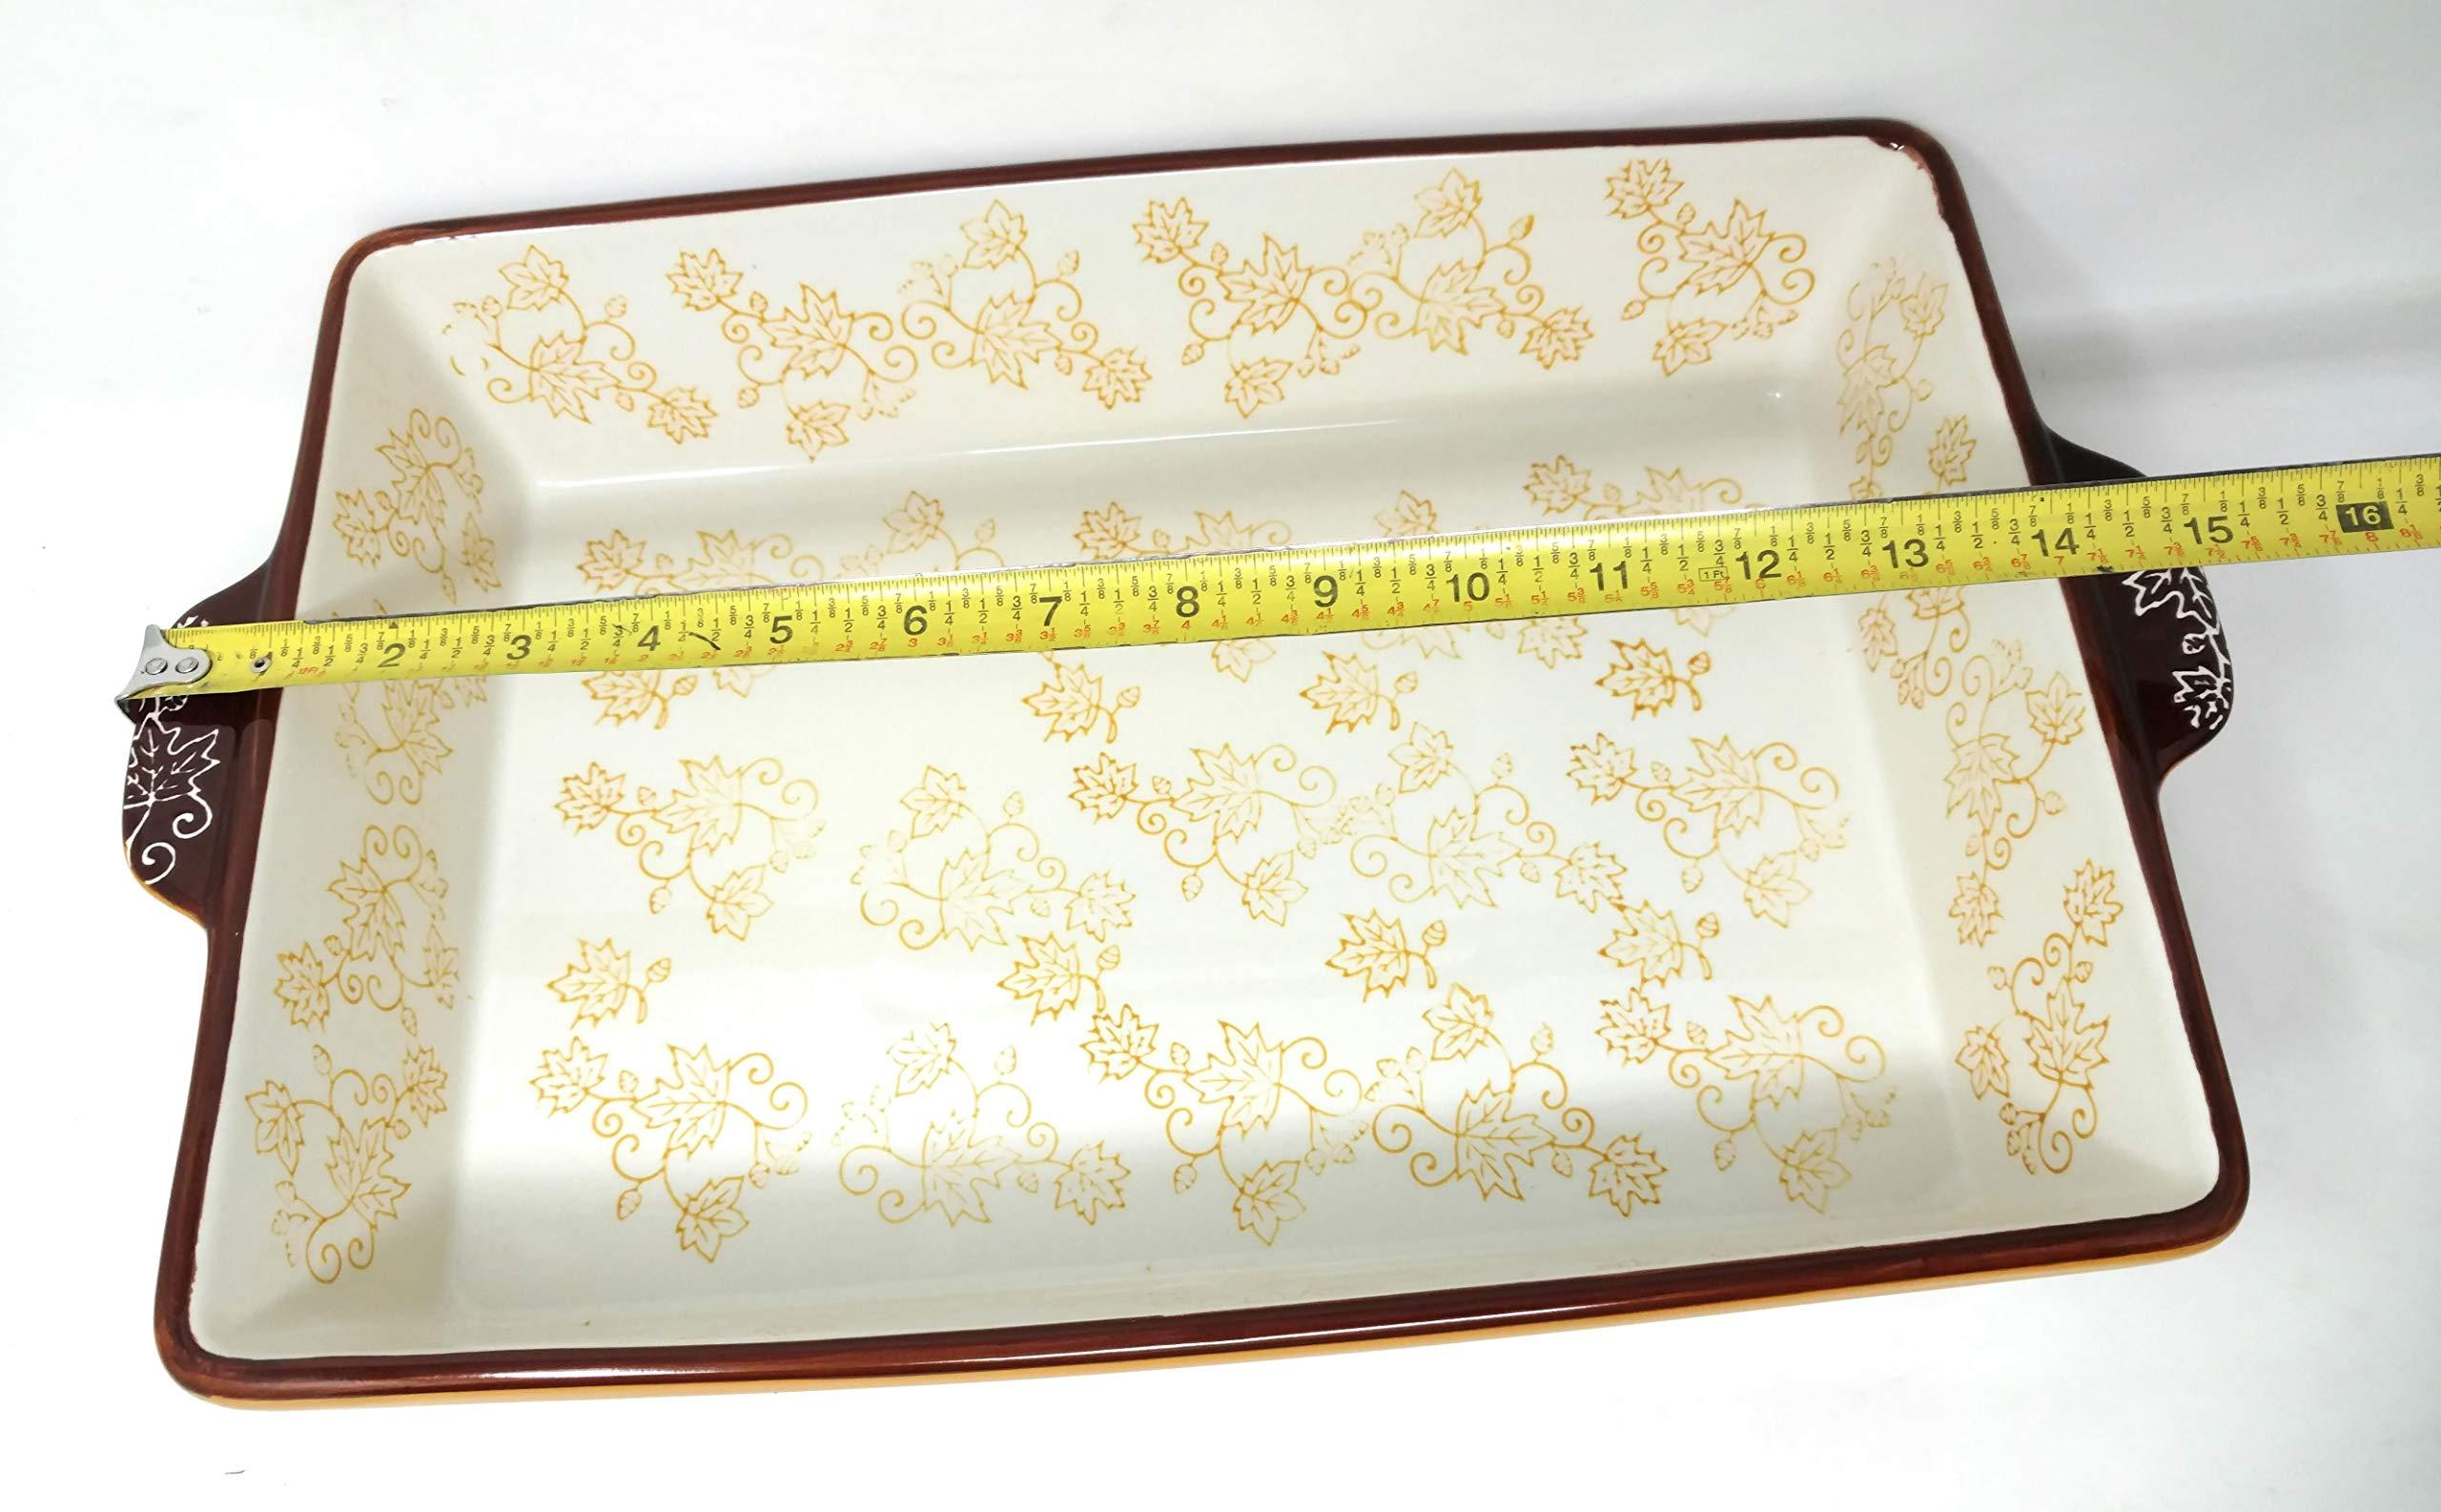 Temp-tations 4 Qt Baker Casserole Dish (13x9) w/Cookie Sheet(Lid-It) (Old World Spice) by Temptations (Image #5)